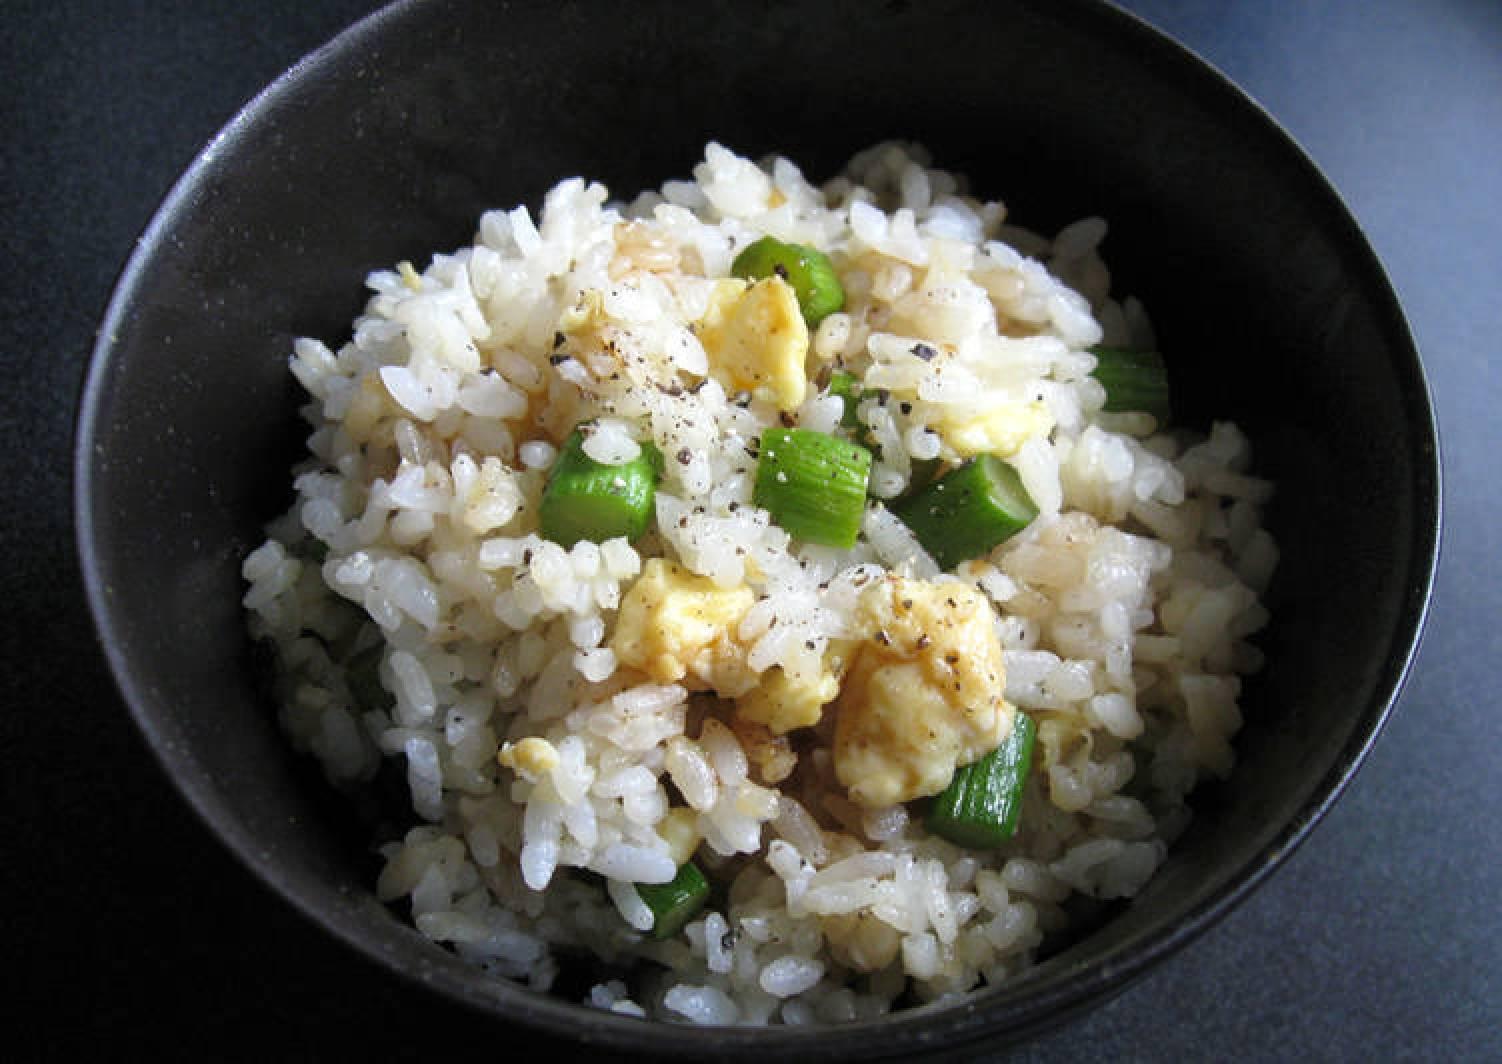 Asparagus & Egg Mazegohan